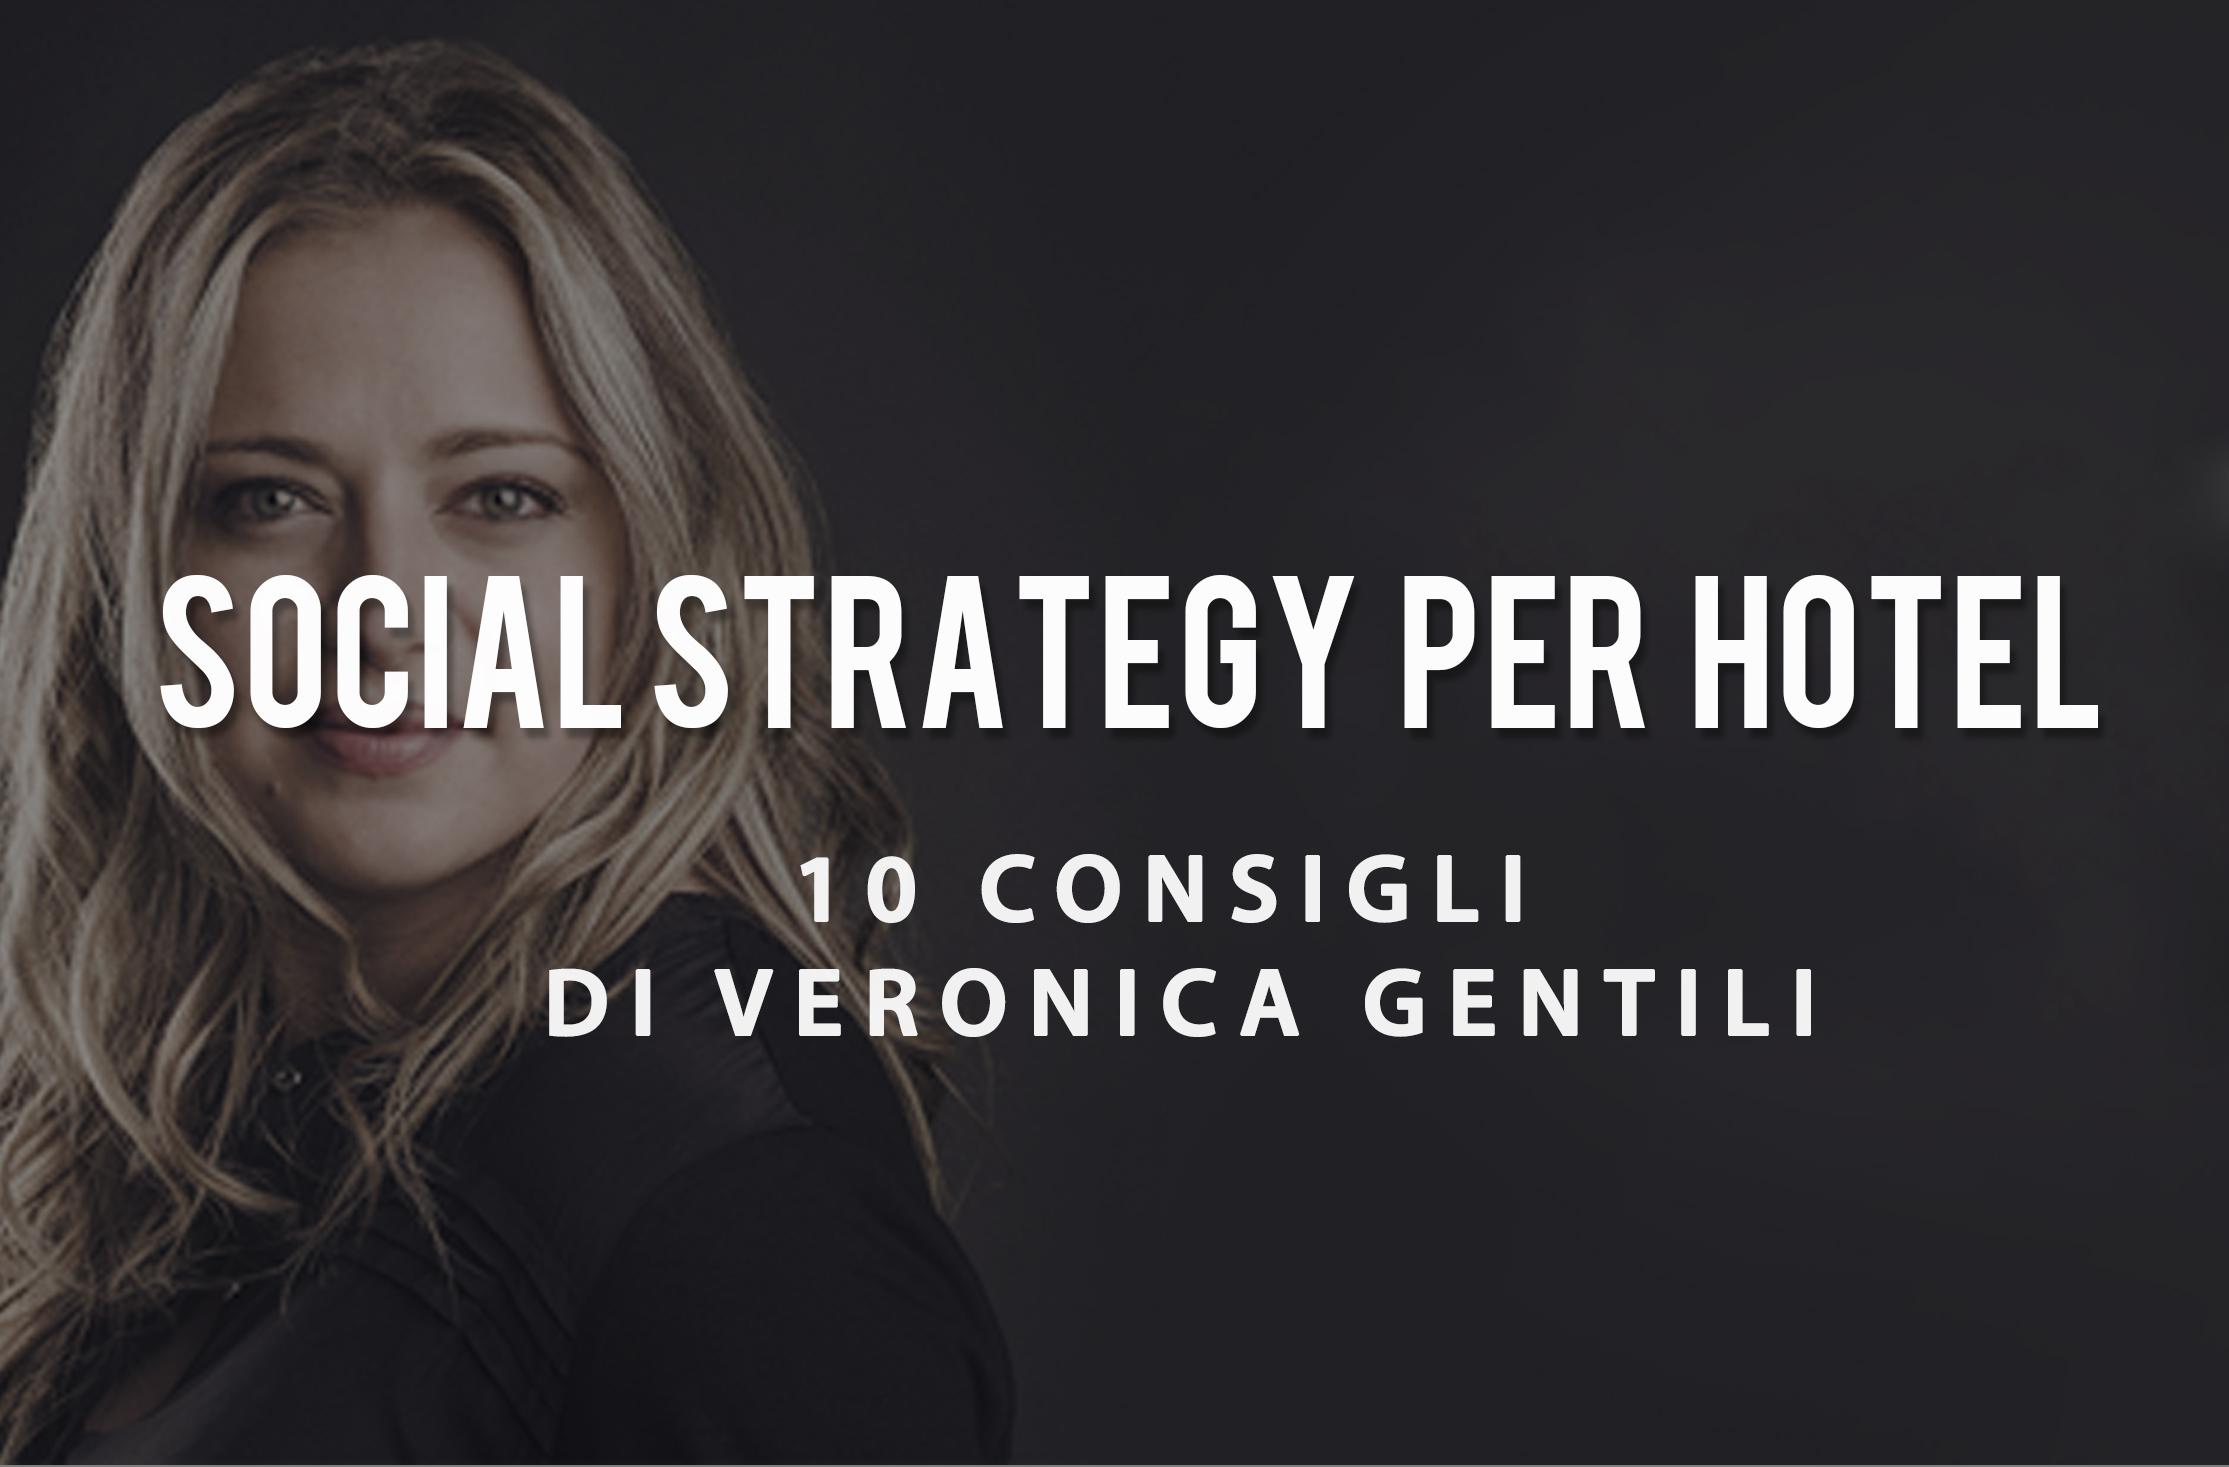 Intervista a Veronica Gentili